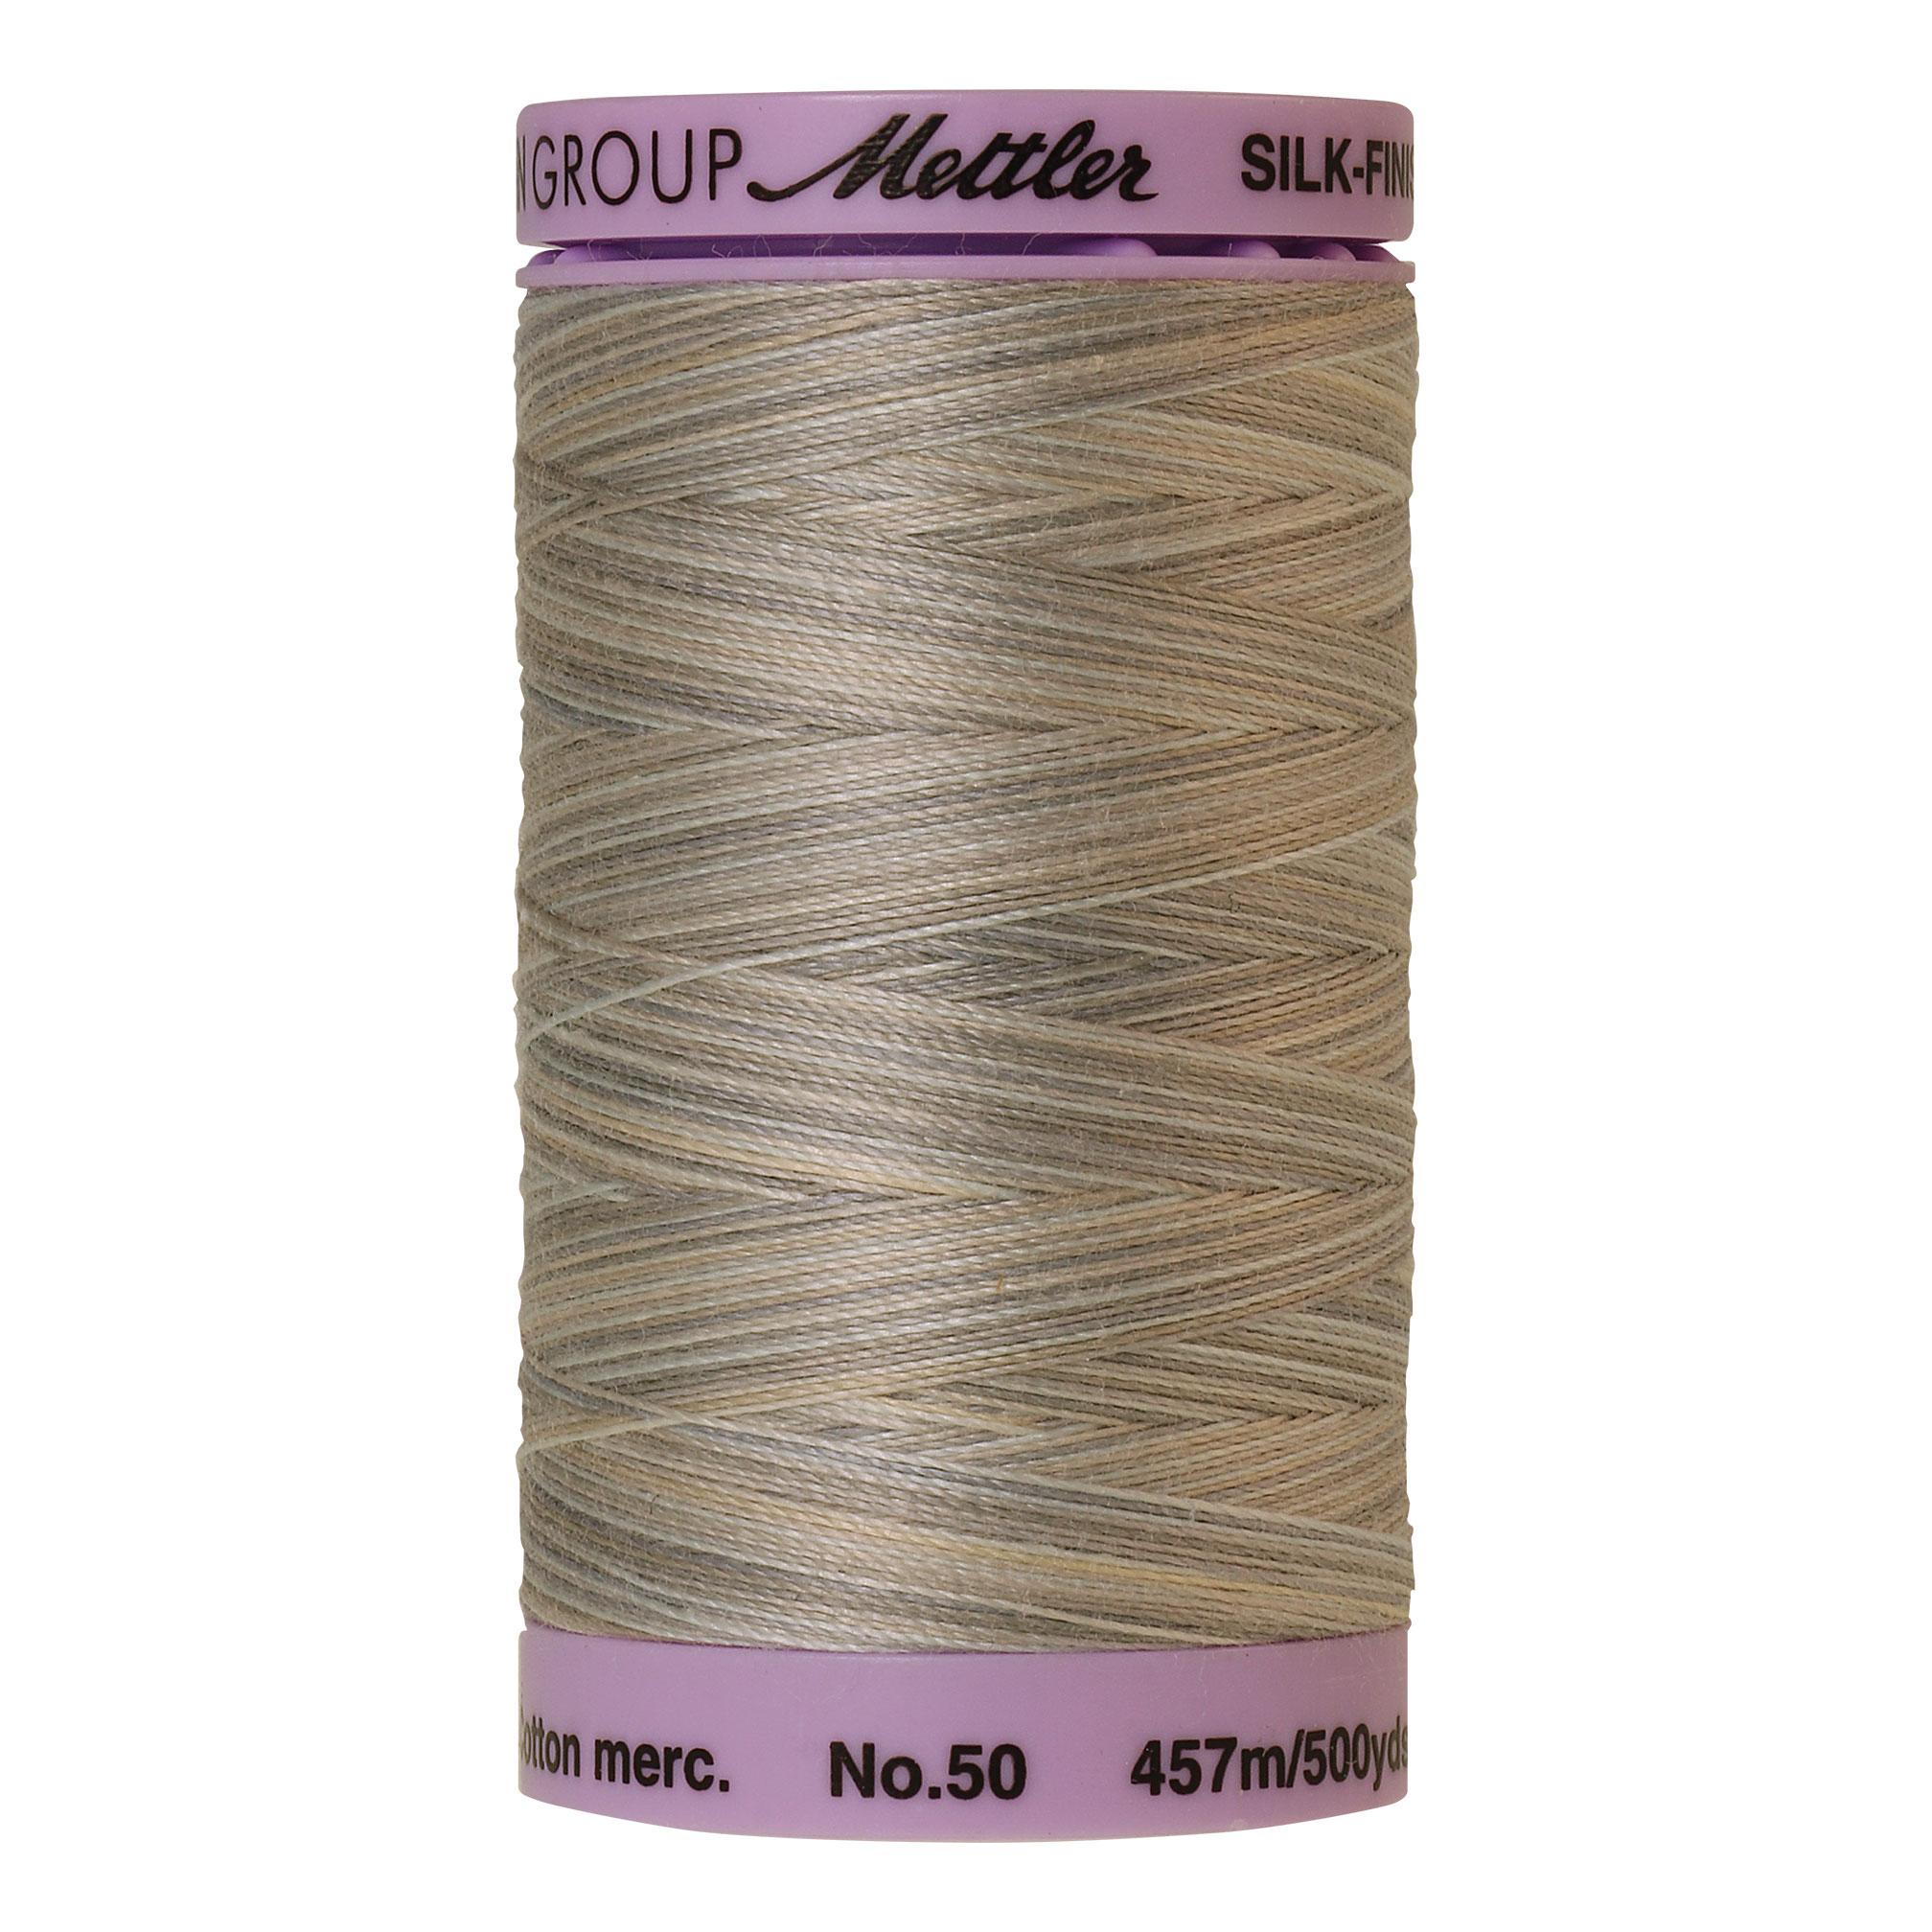 Silk Finish cotton 50wt 500 yards Dove Gray